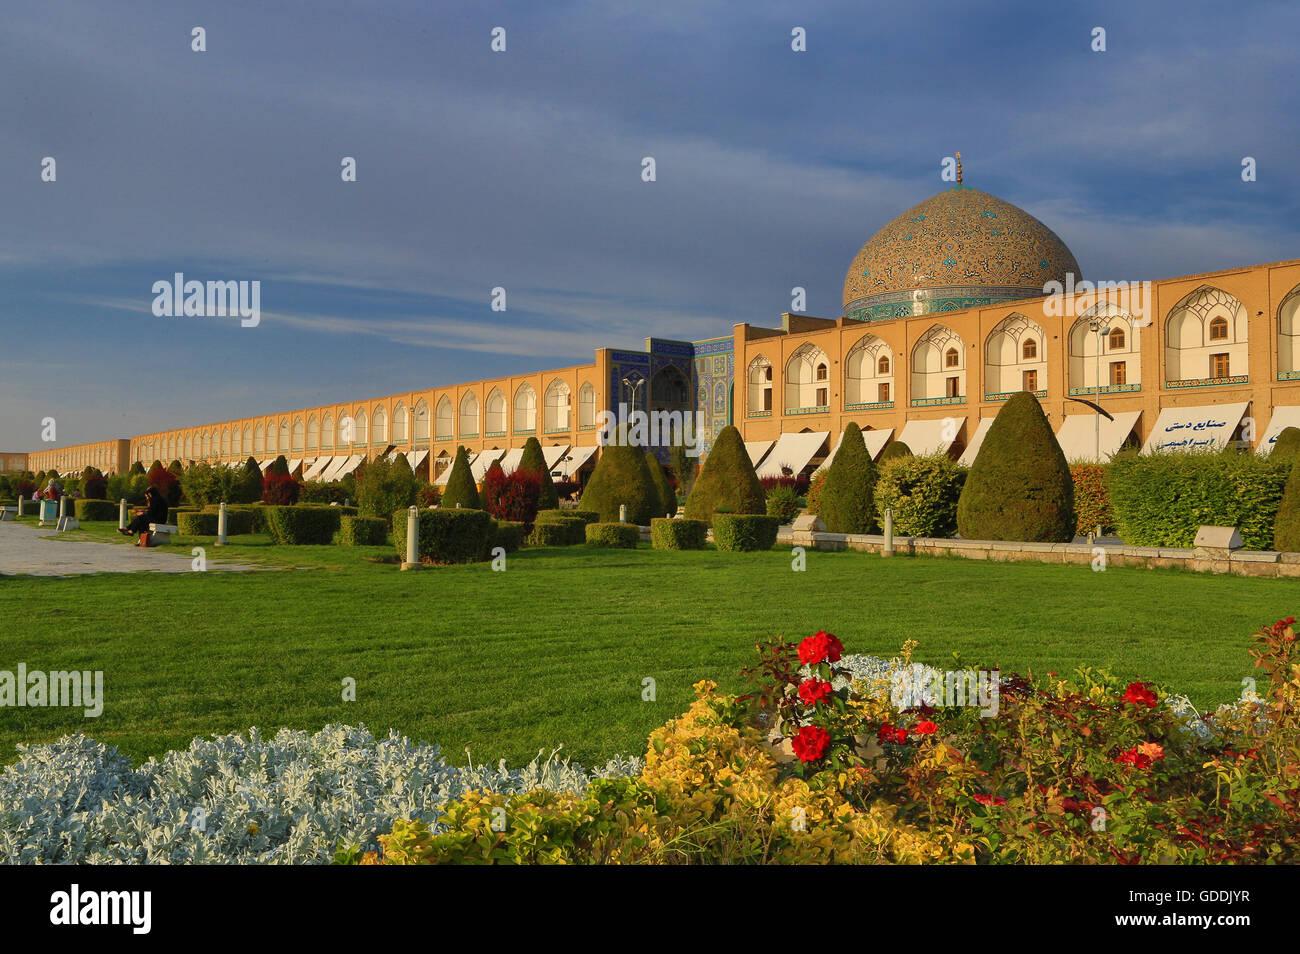 Iran,Esfahan City,Naqsh-e Jahan Square,Sheikh Lotfollah Mosque, - Stock Image